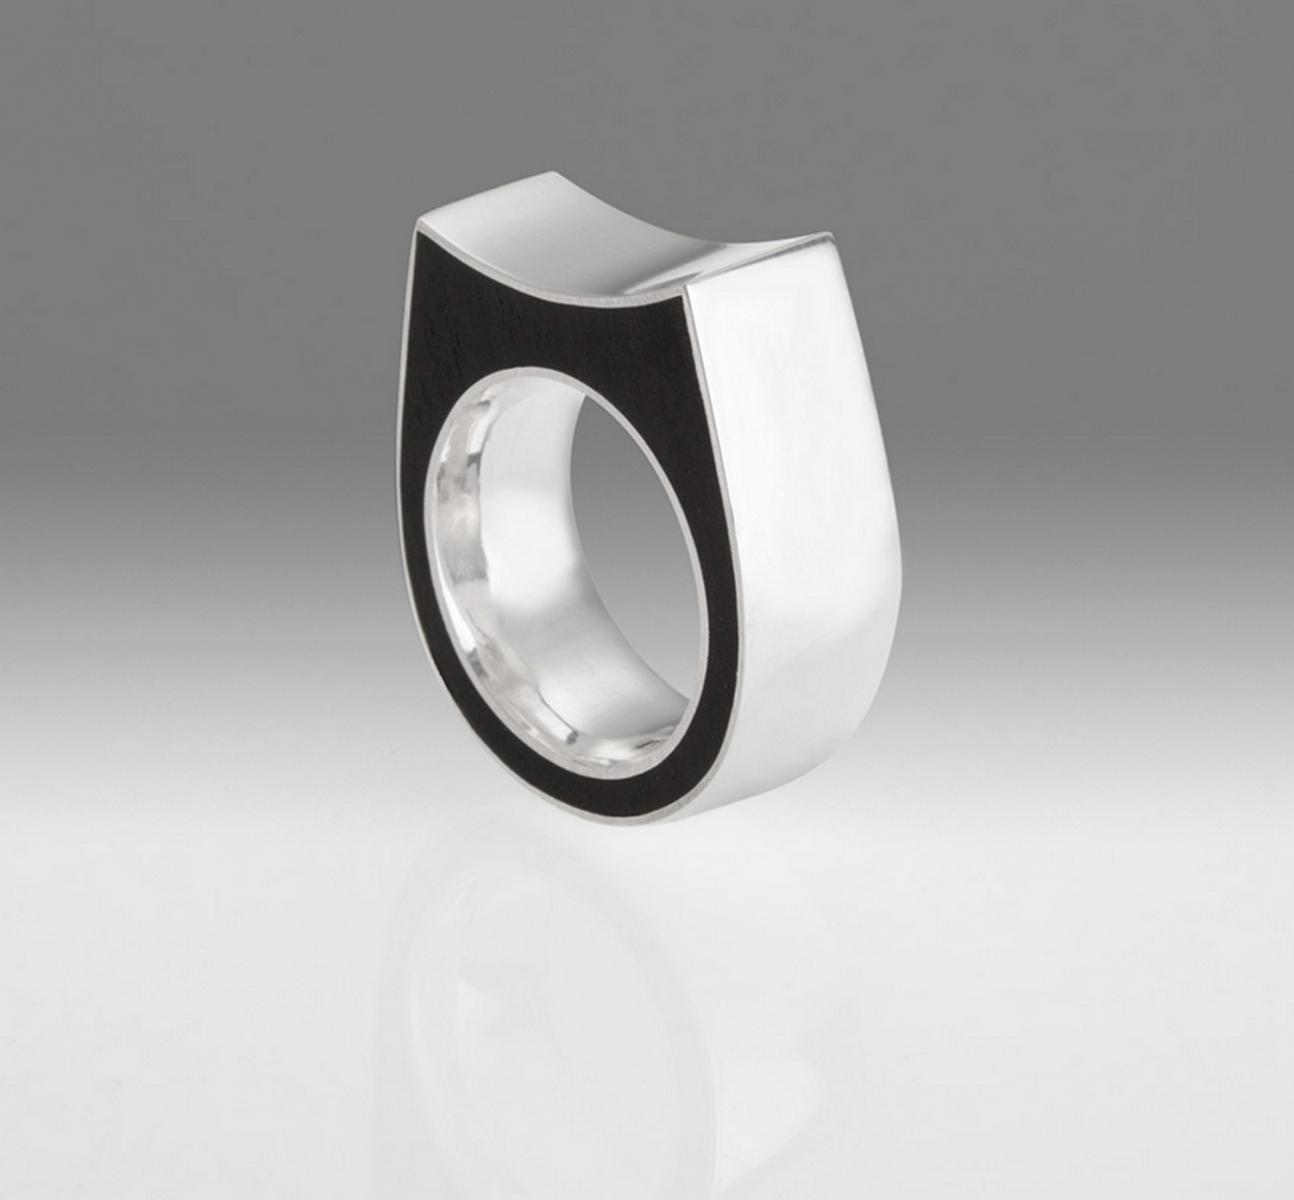 Pierścień. srebro i heban / silver and ebony ring